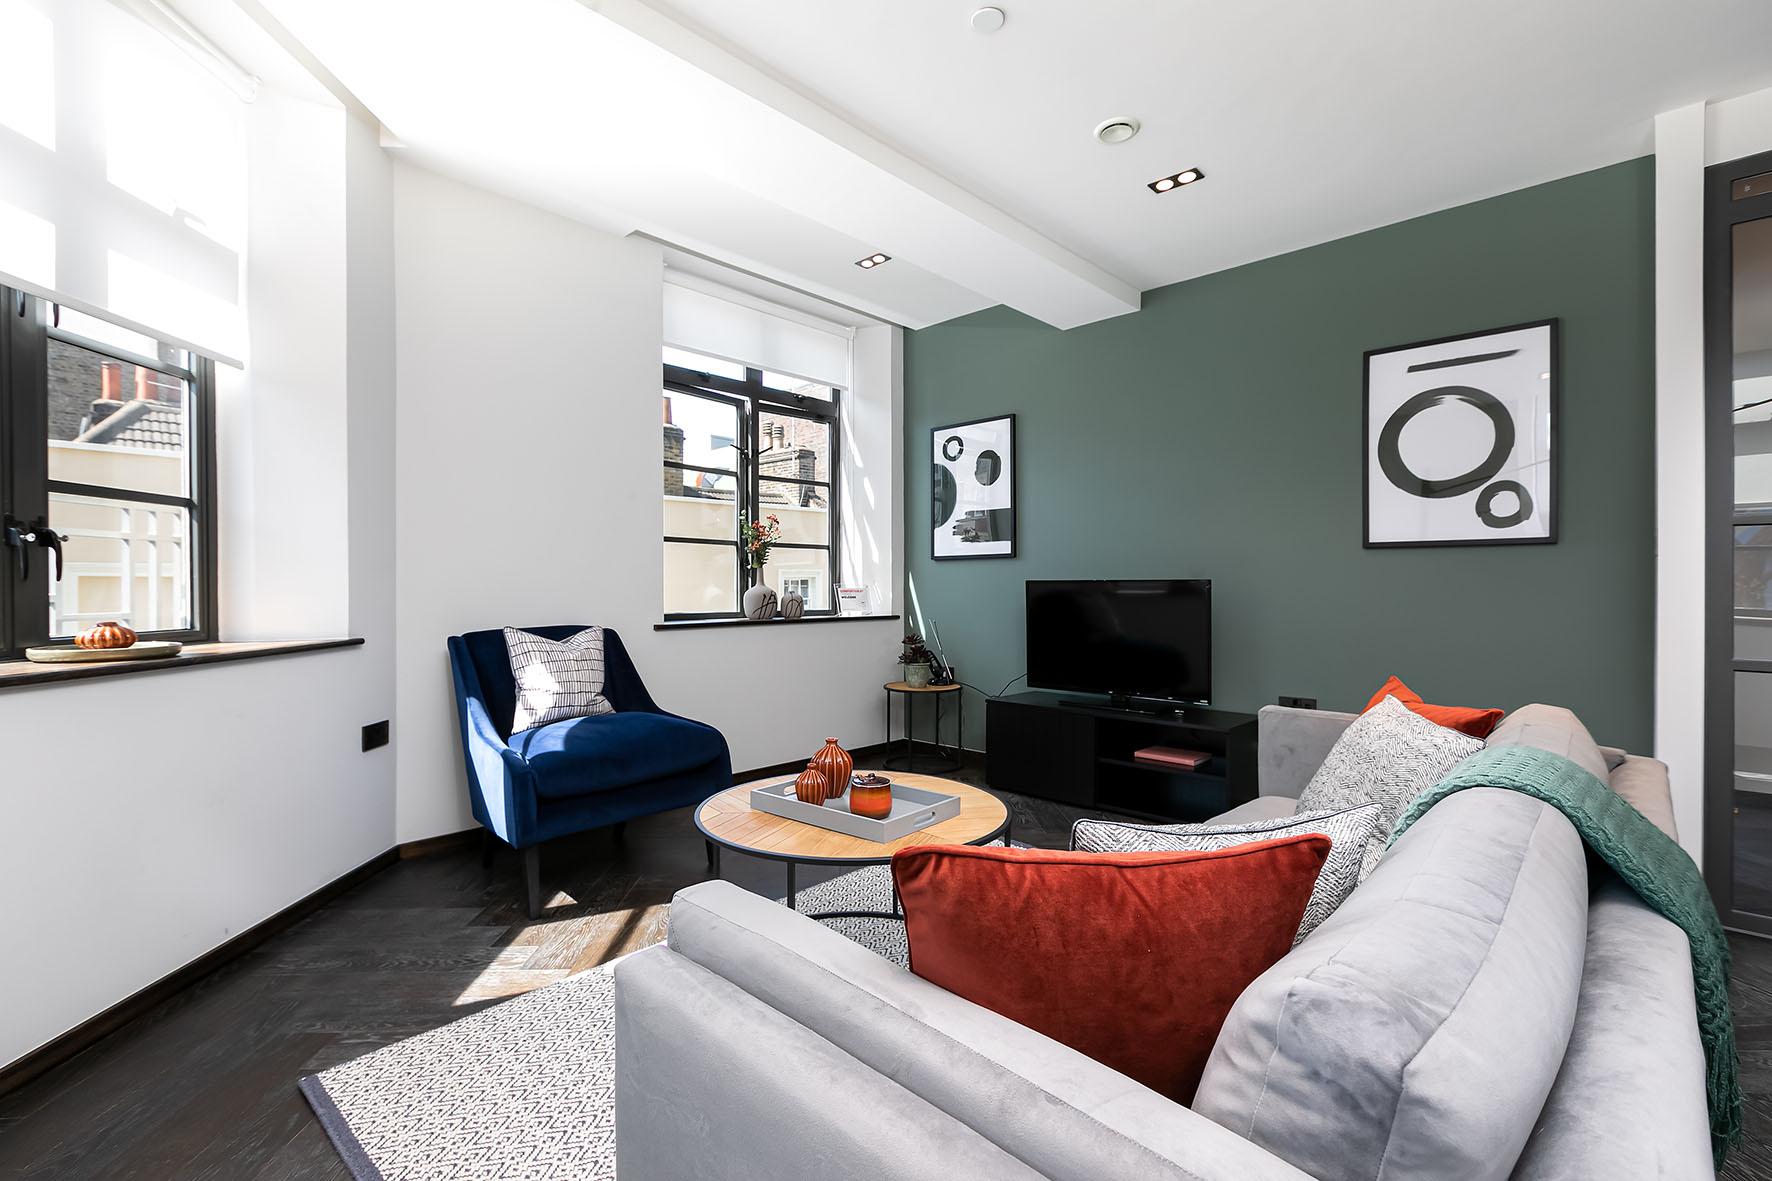 Lovelydays luxury service apartment rental - London - Soho - Oxford Street IV - Lovelysuite - 2 bedrooms - 2 bathrooms - Luxury living room - ed6d5c371adf - Lovelydays